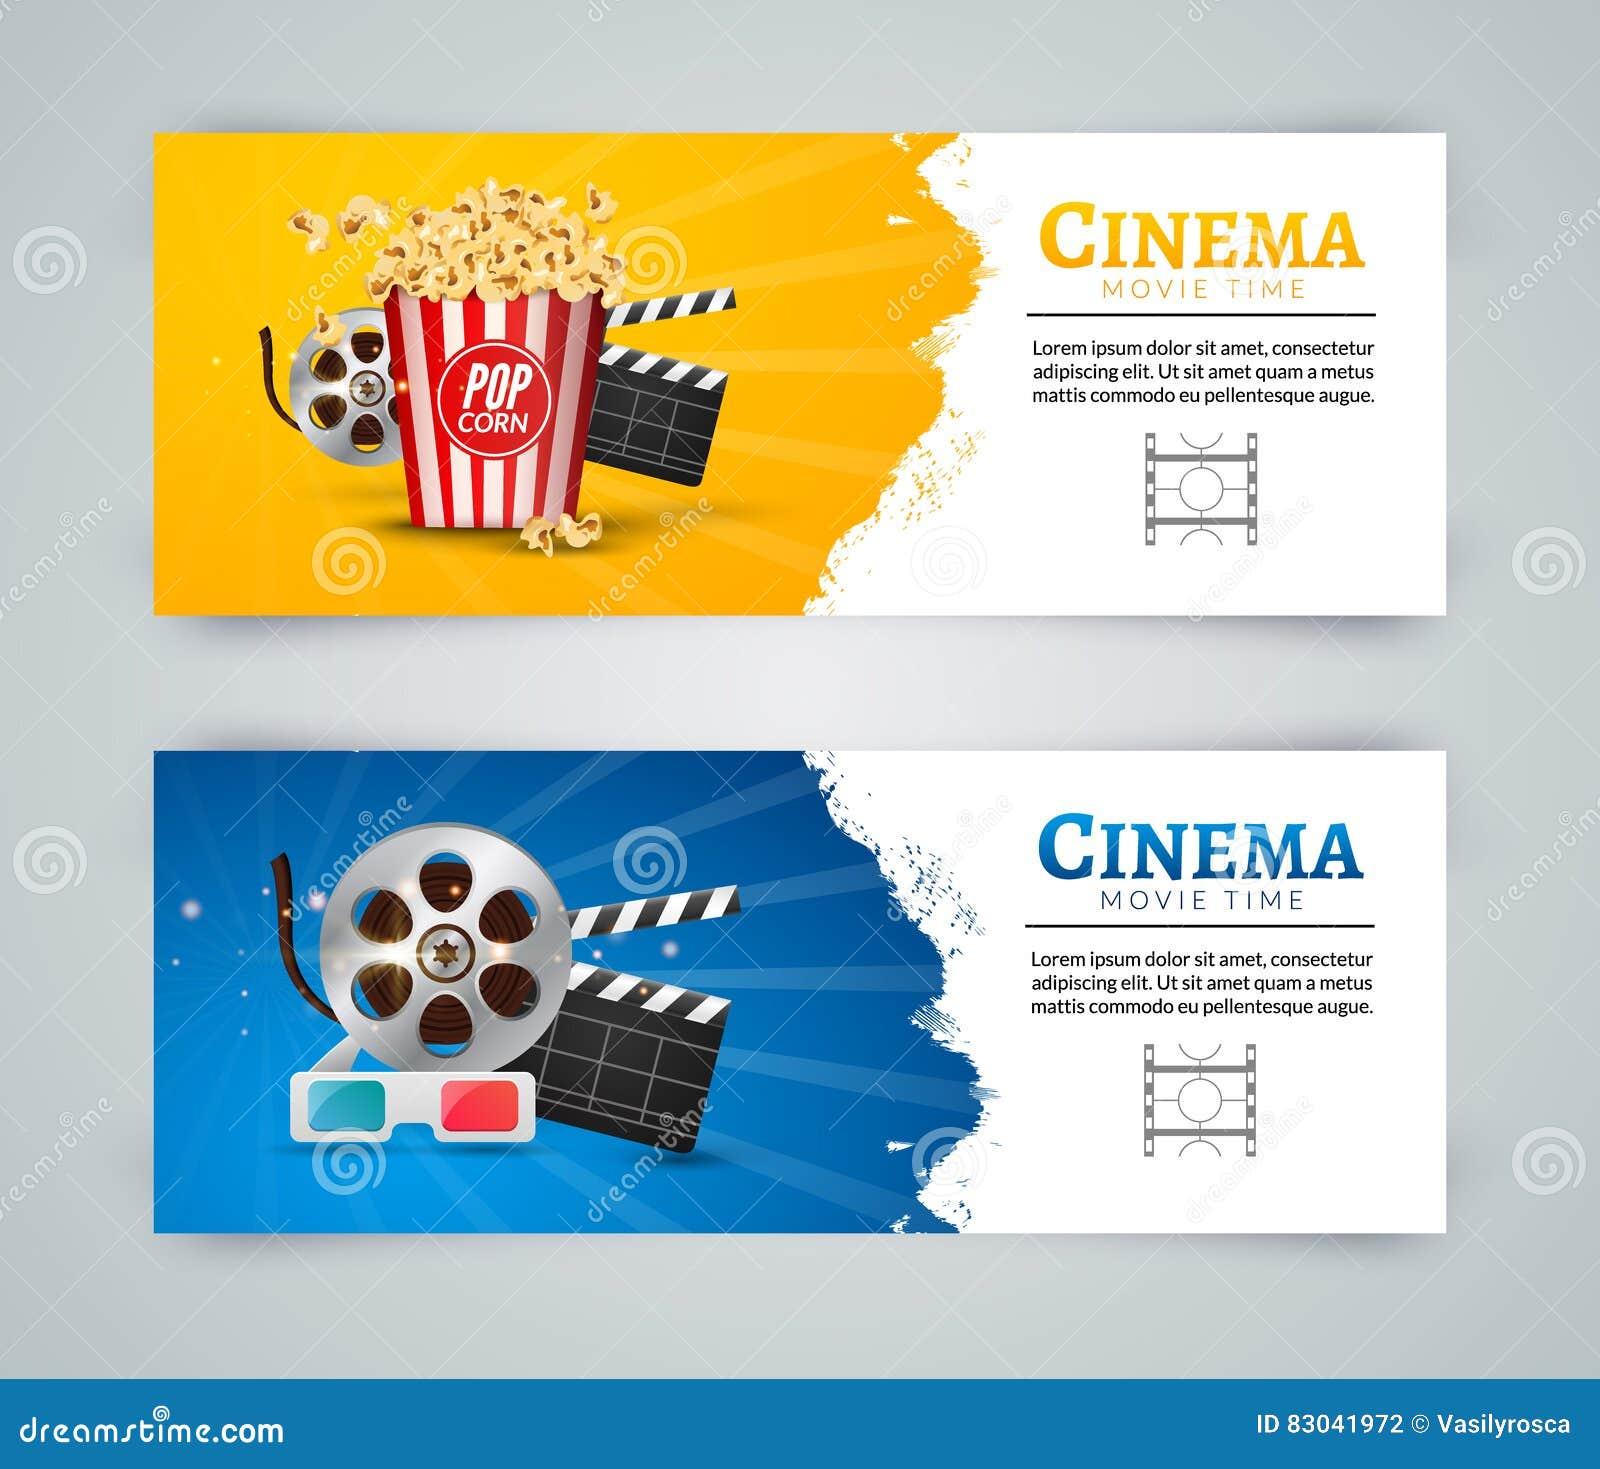 Poster design template - Cinema Movie Banner Poster Design Template Film Clapper 3d Glasses Popcorn Cinema Banner Layout